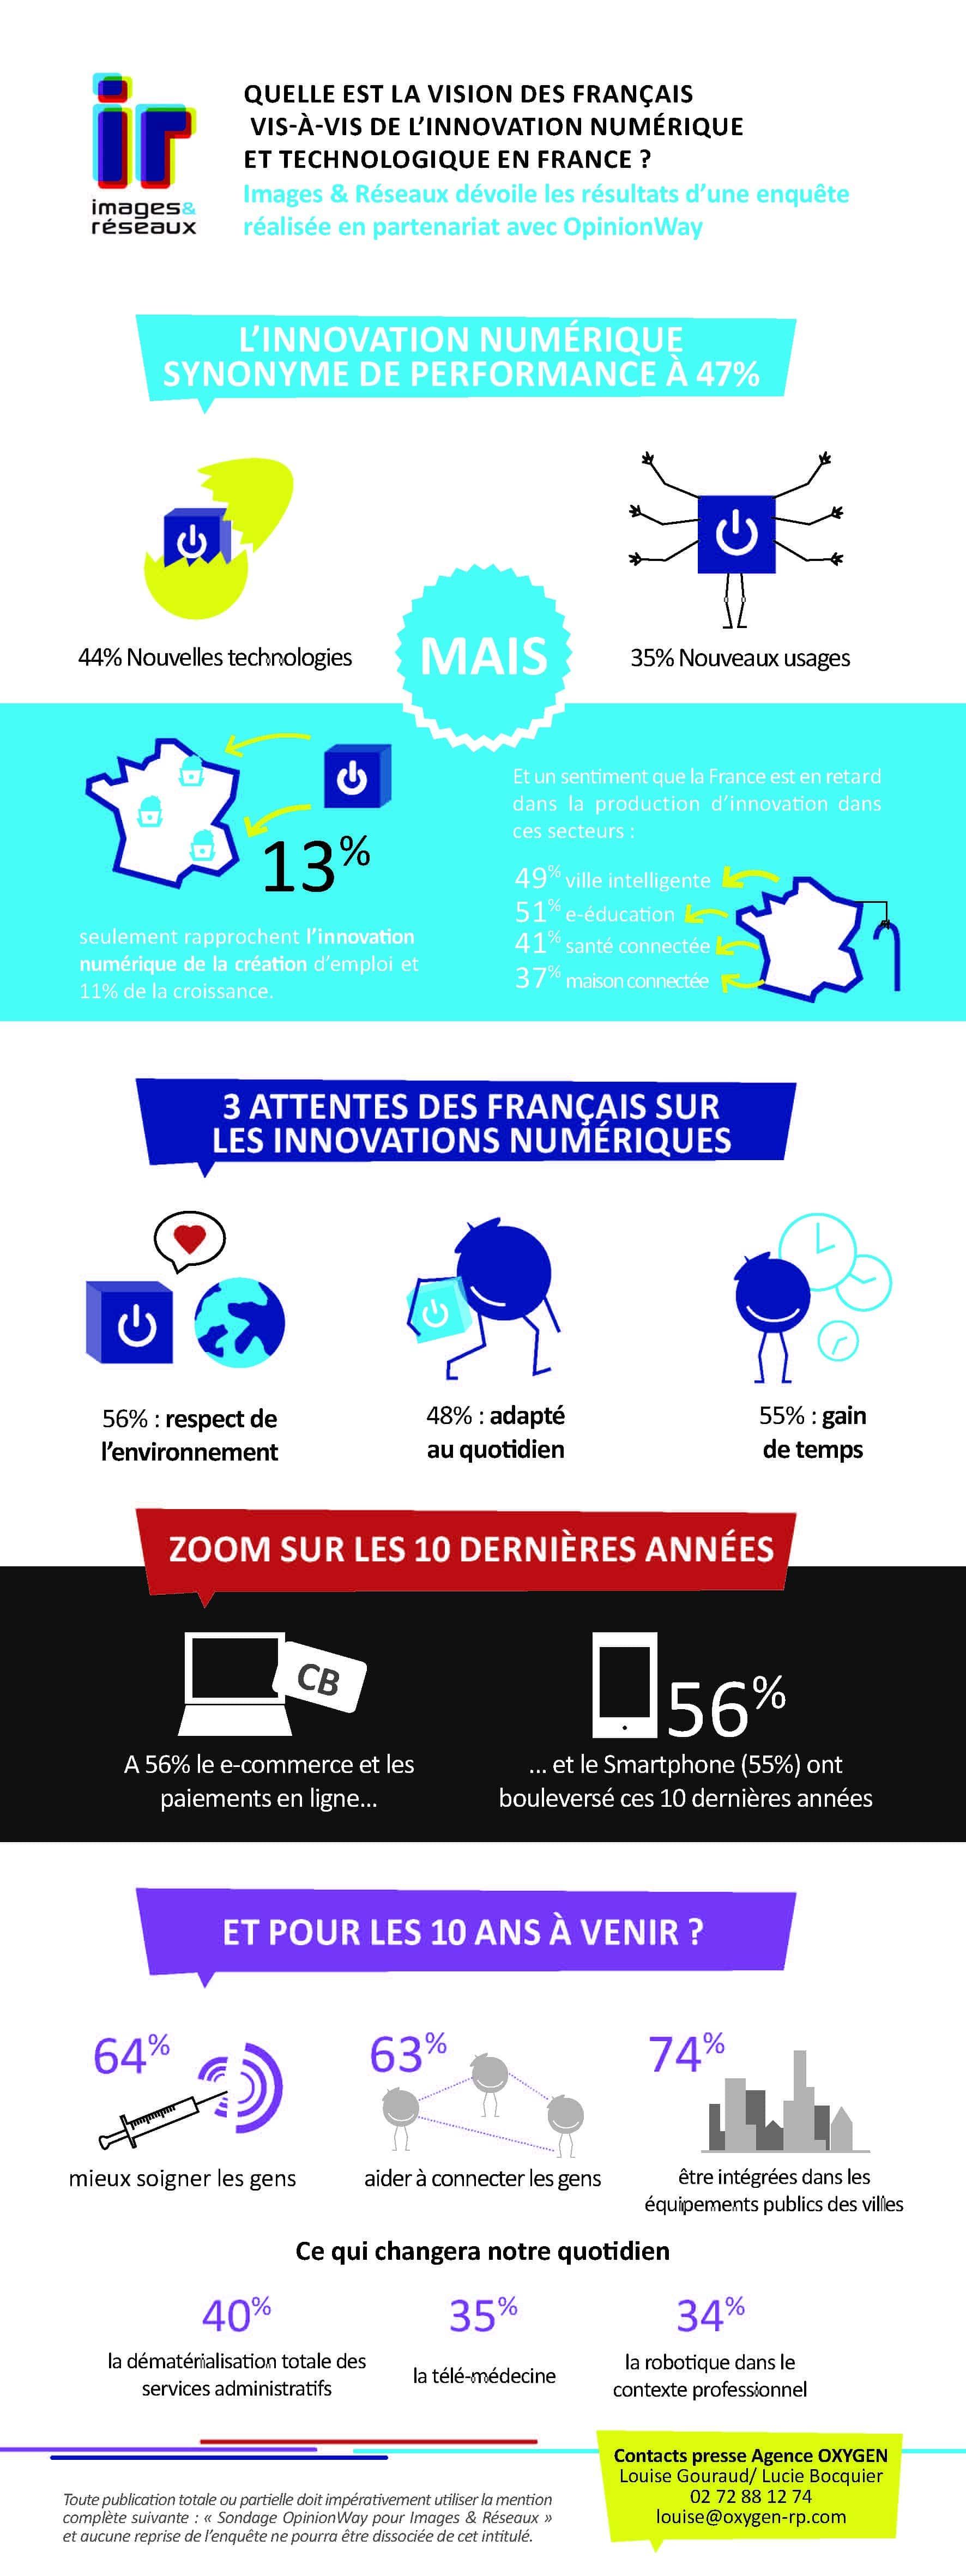 infographie-images-réseaux-opinionWay